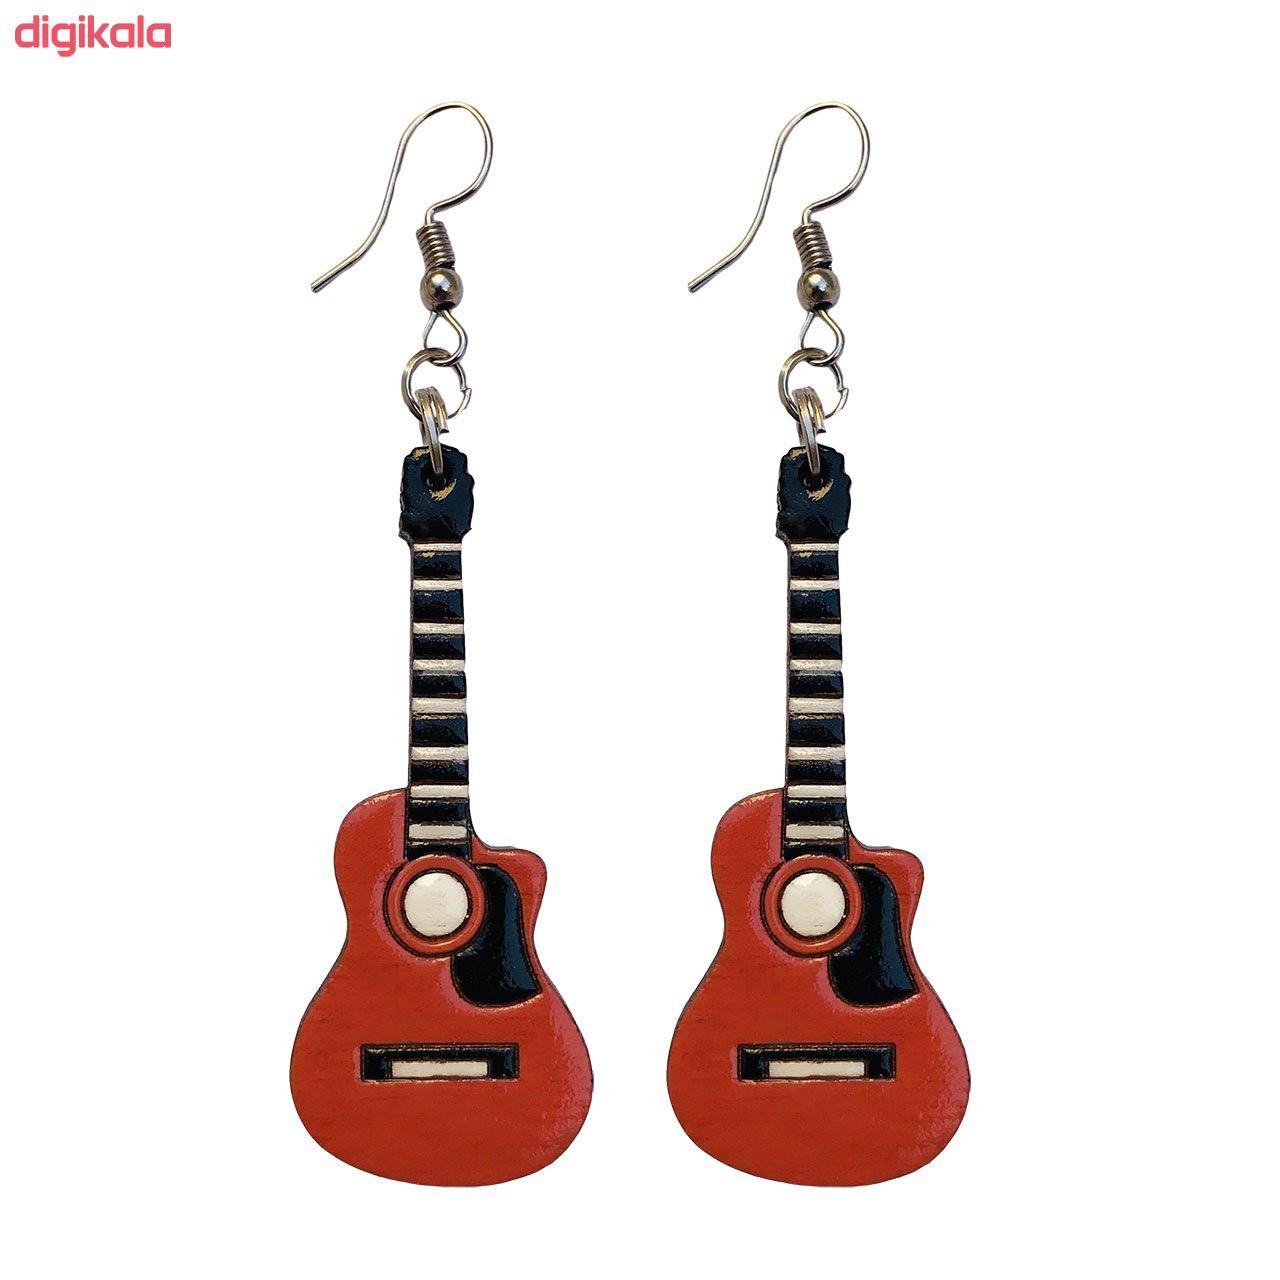 گوشواره زنانه طرح گیتار کلاسیک کد 012 main 1 1